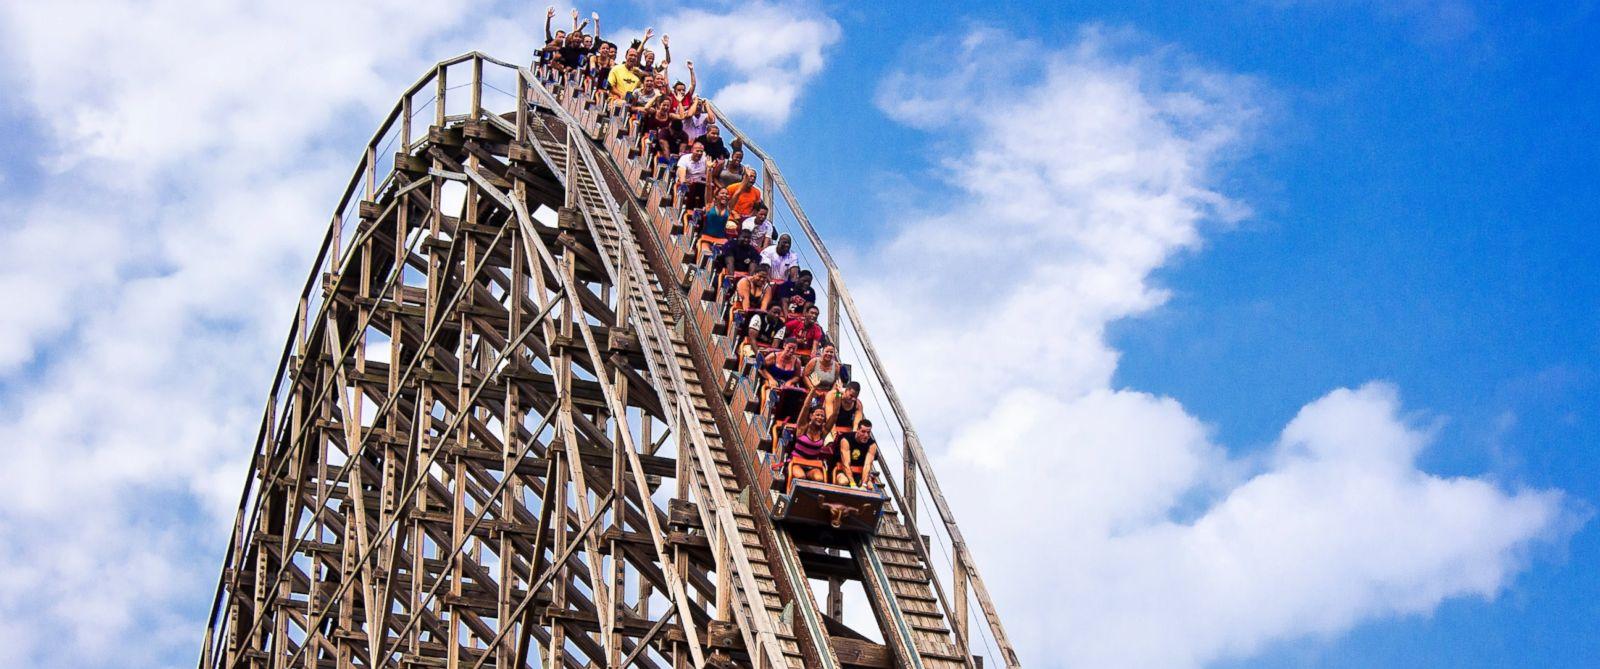 PHOTO: The El Toro wooden roller coaster at Great Adventure Park.